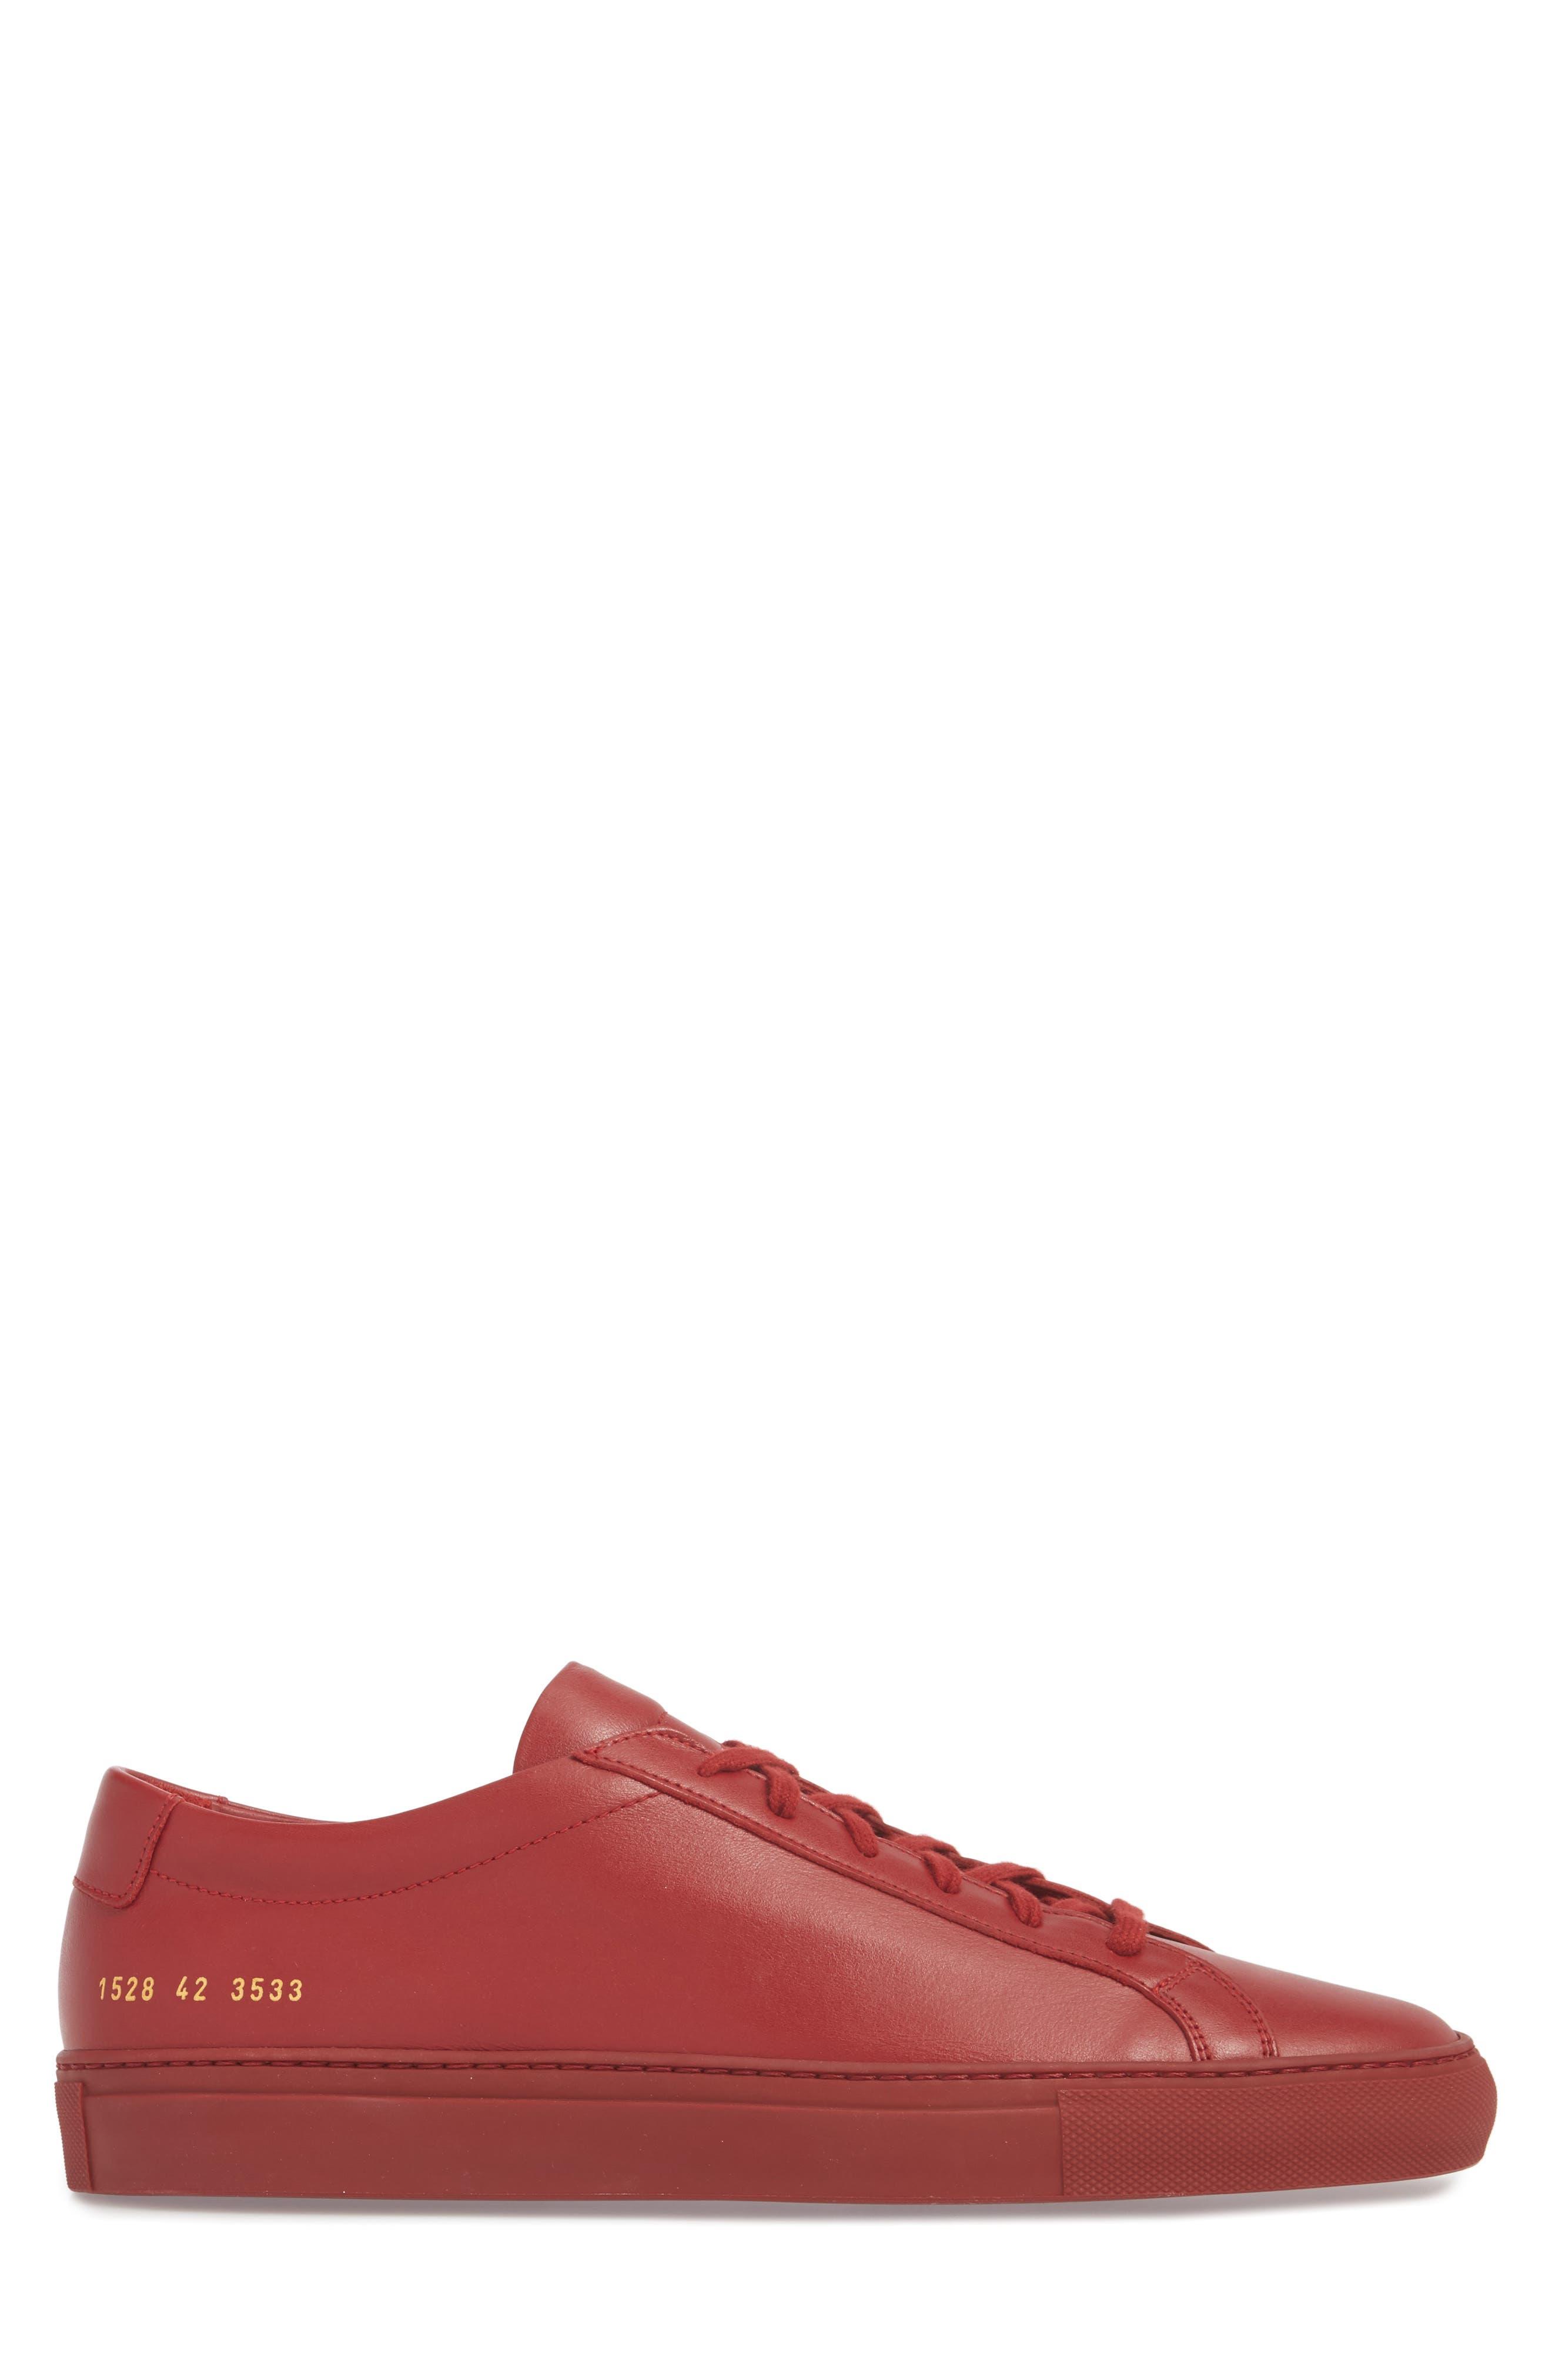 Original Achilles Sneaker,                             Alternate thumbnail 3, color,                             RED LEATHER